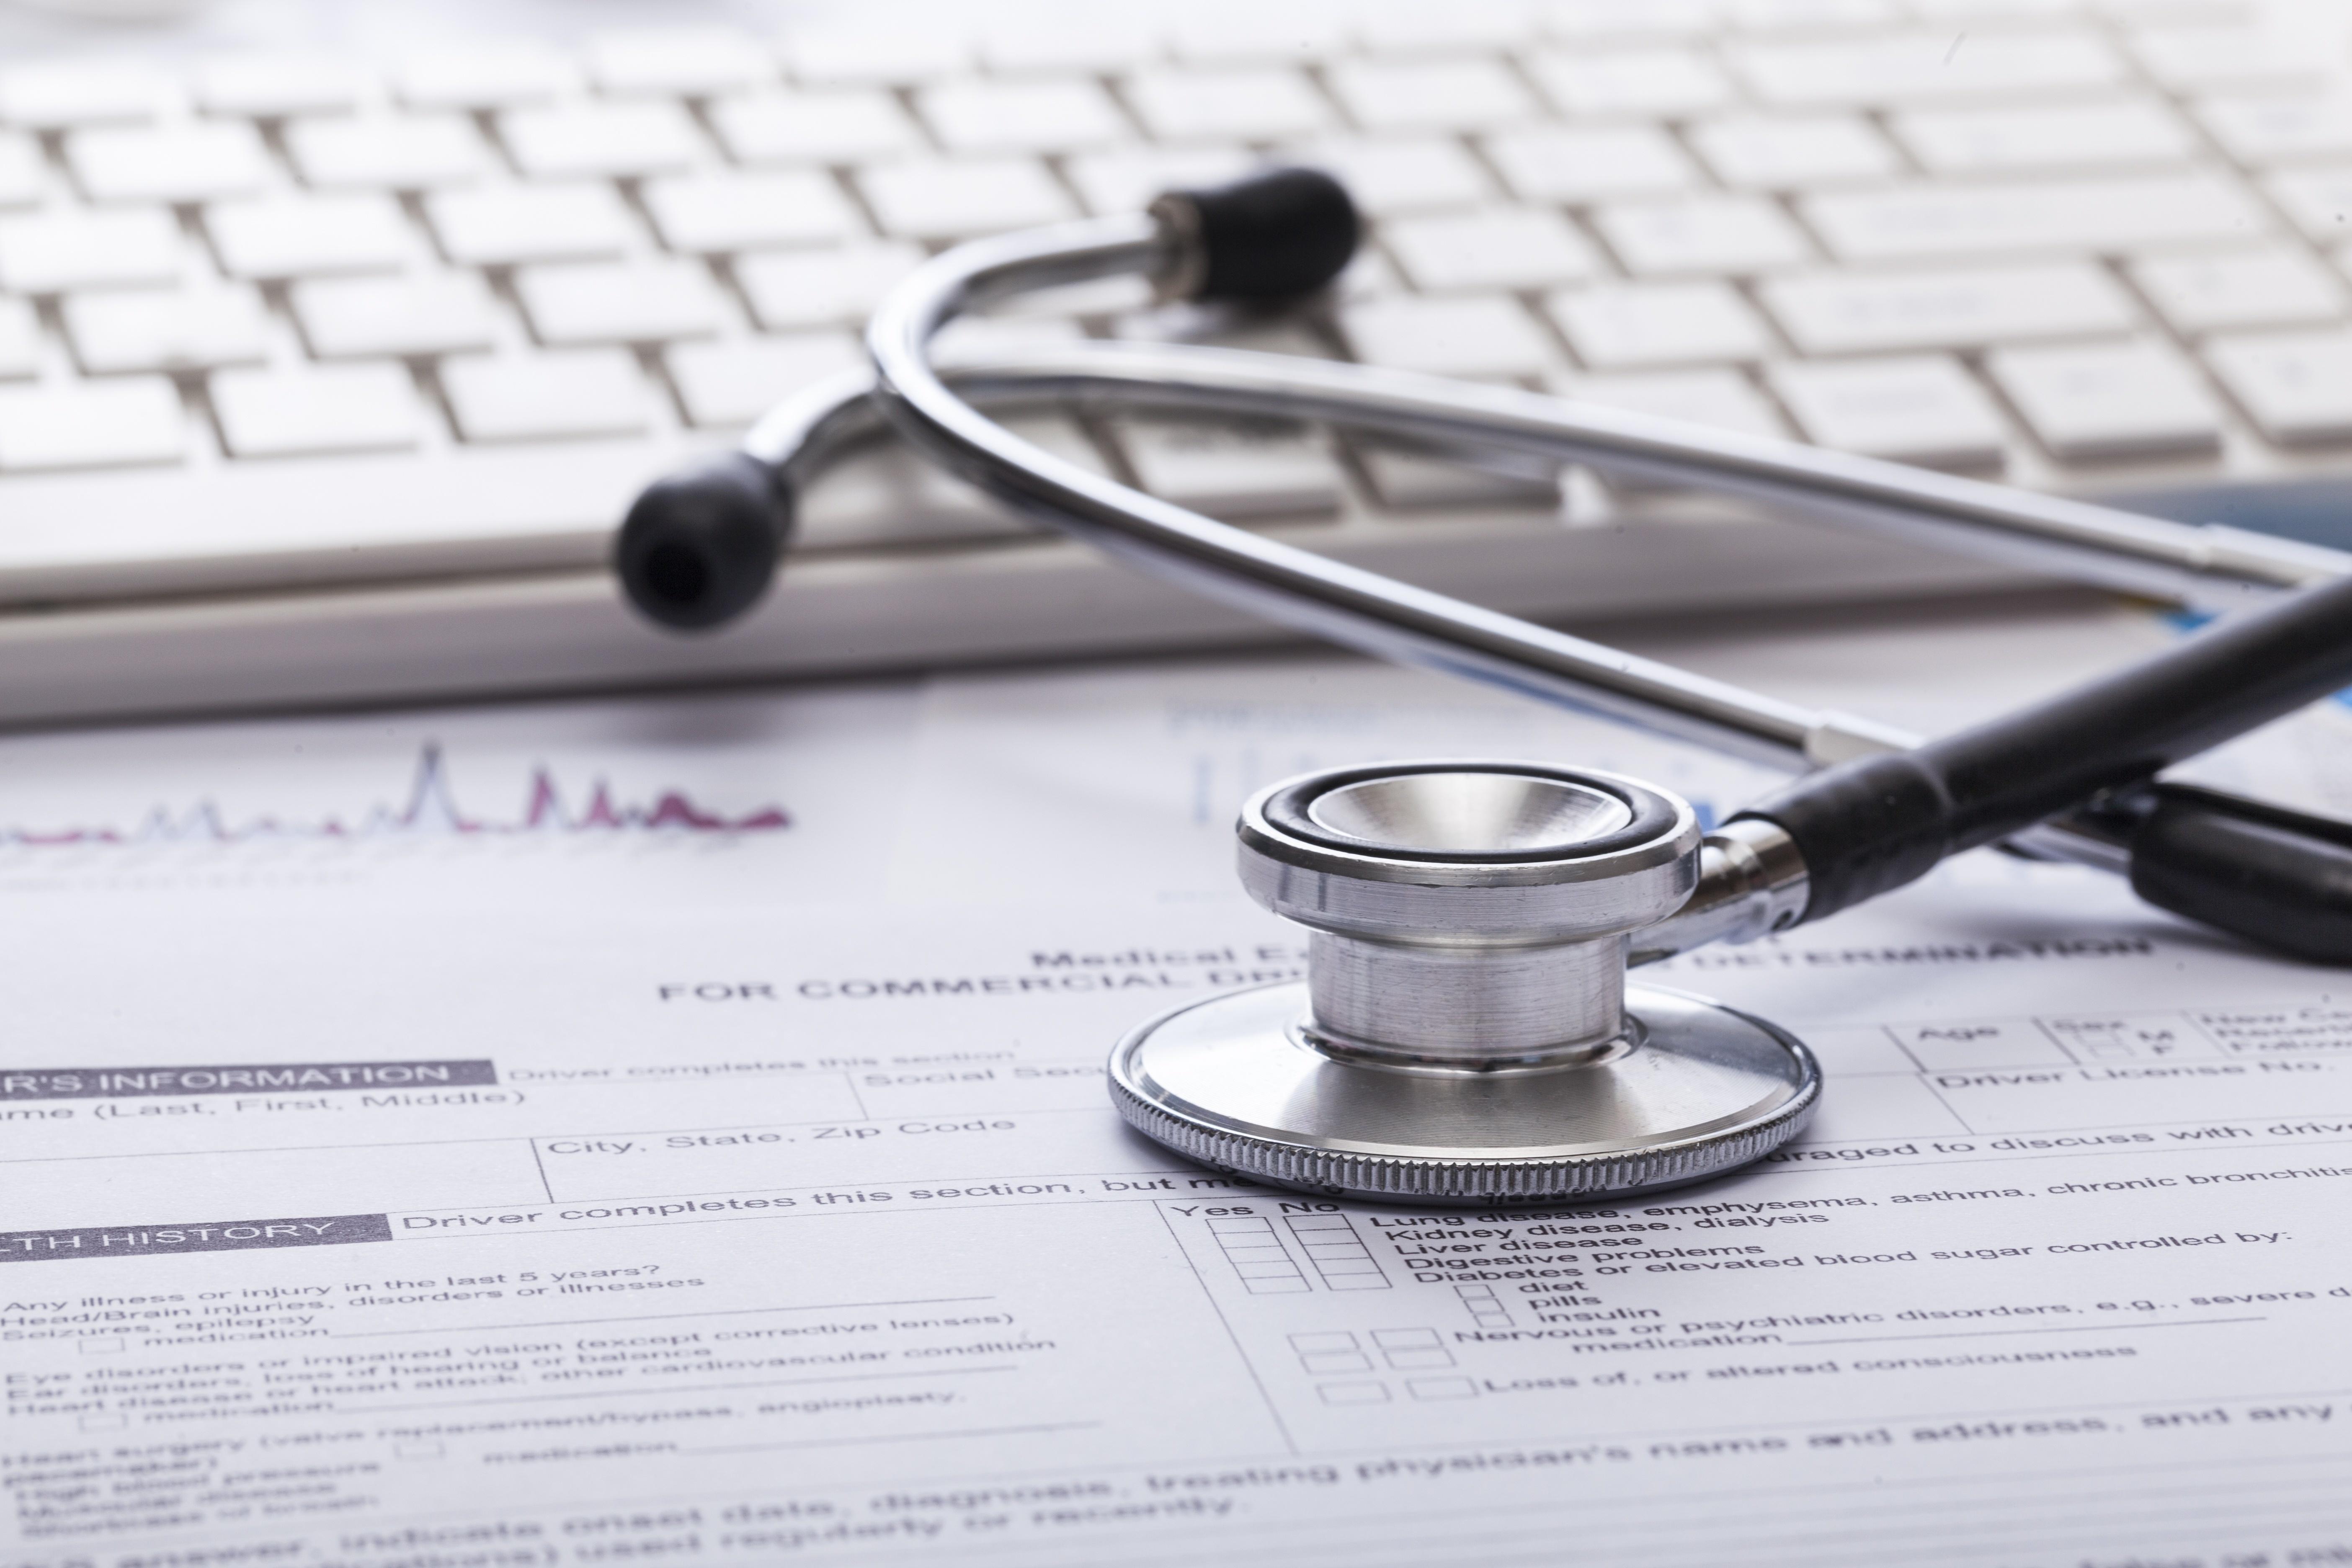 AIM System EMS Ambulance Legal Compliance